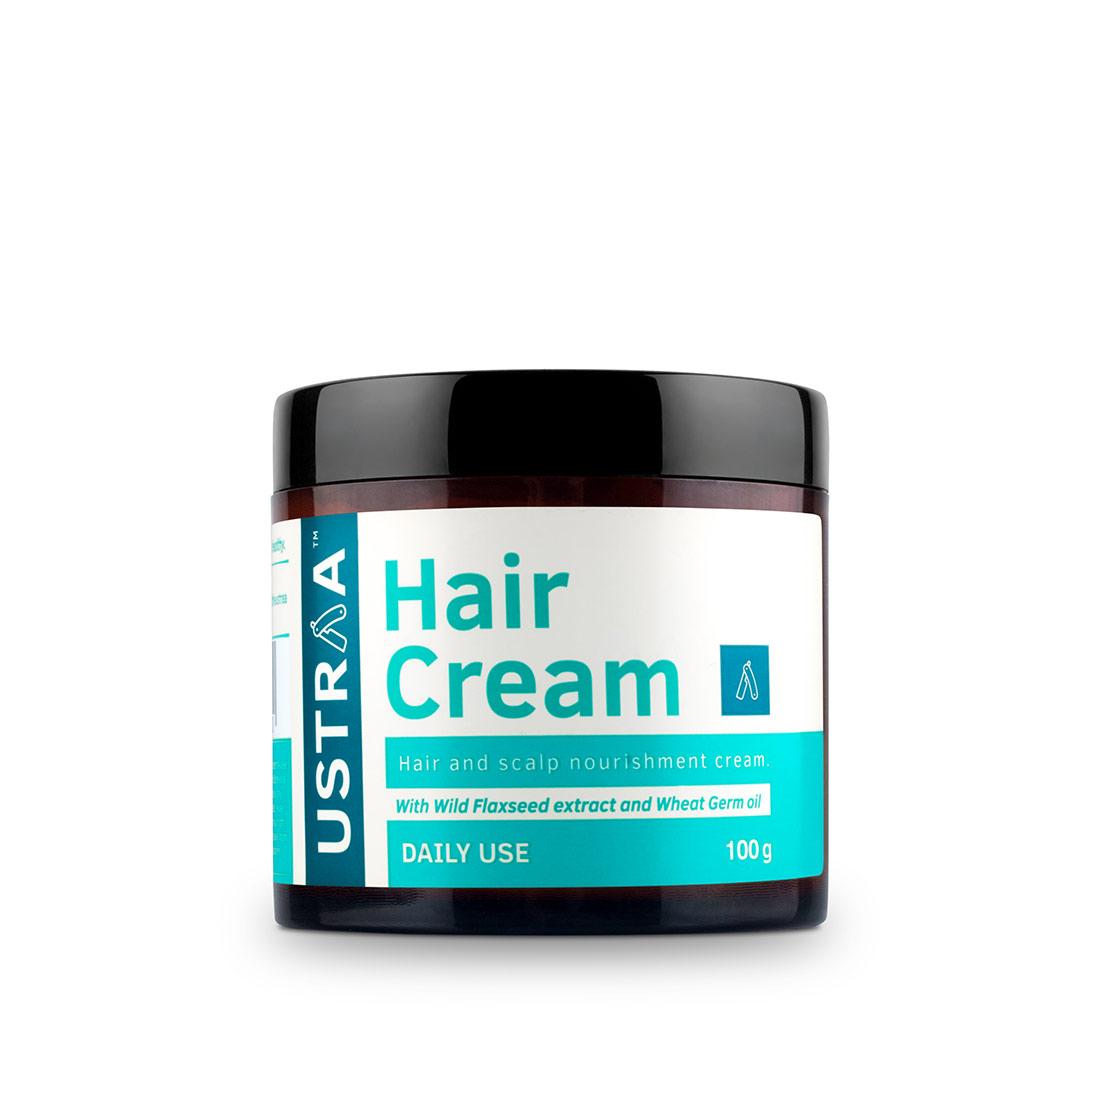 Ustraa | Hair Cream - Daily Use 100g